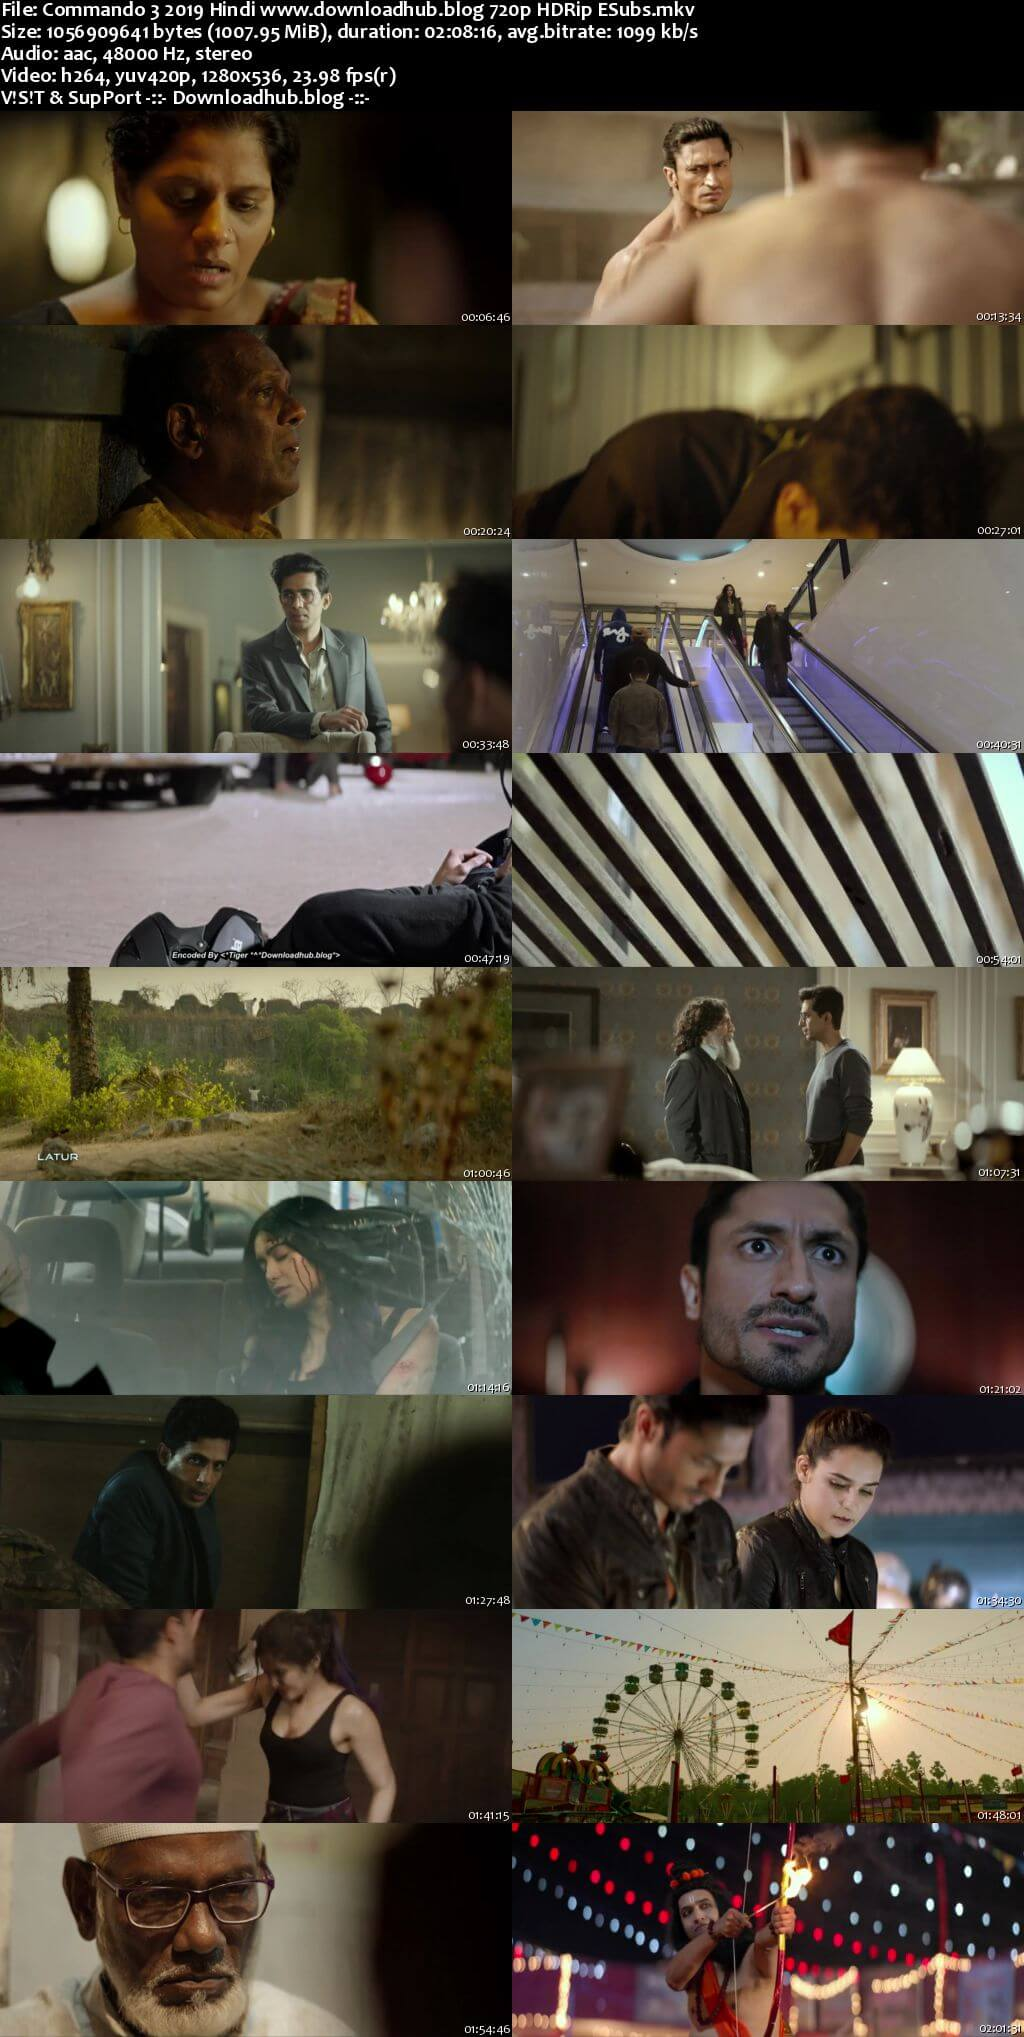 Commando 3 2019 Hindi 720p HDRip ESubs